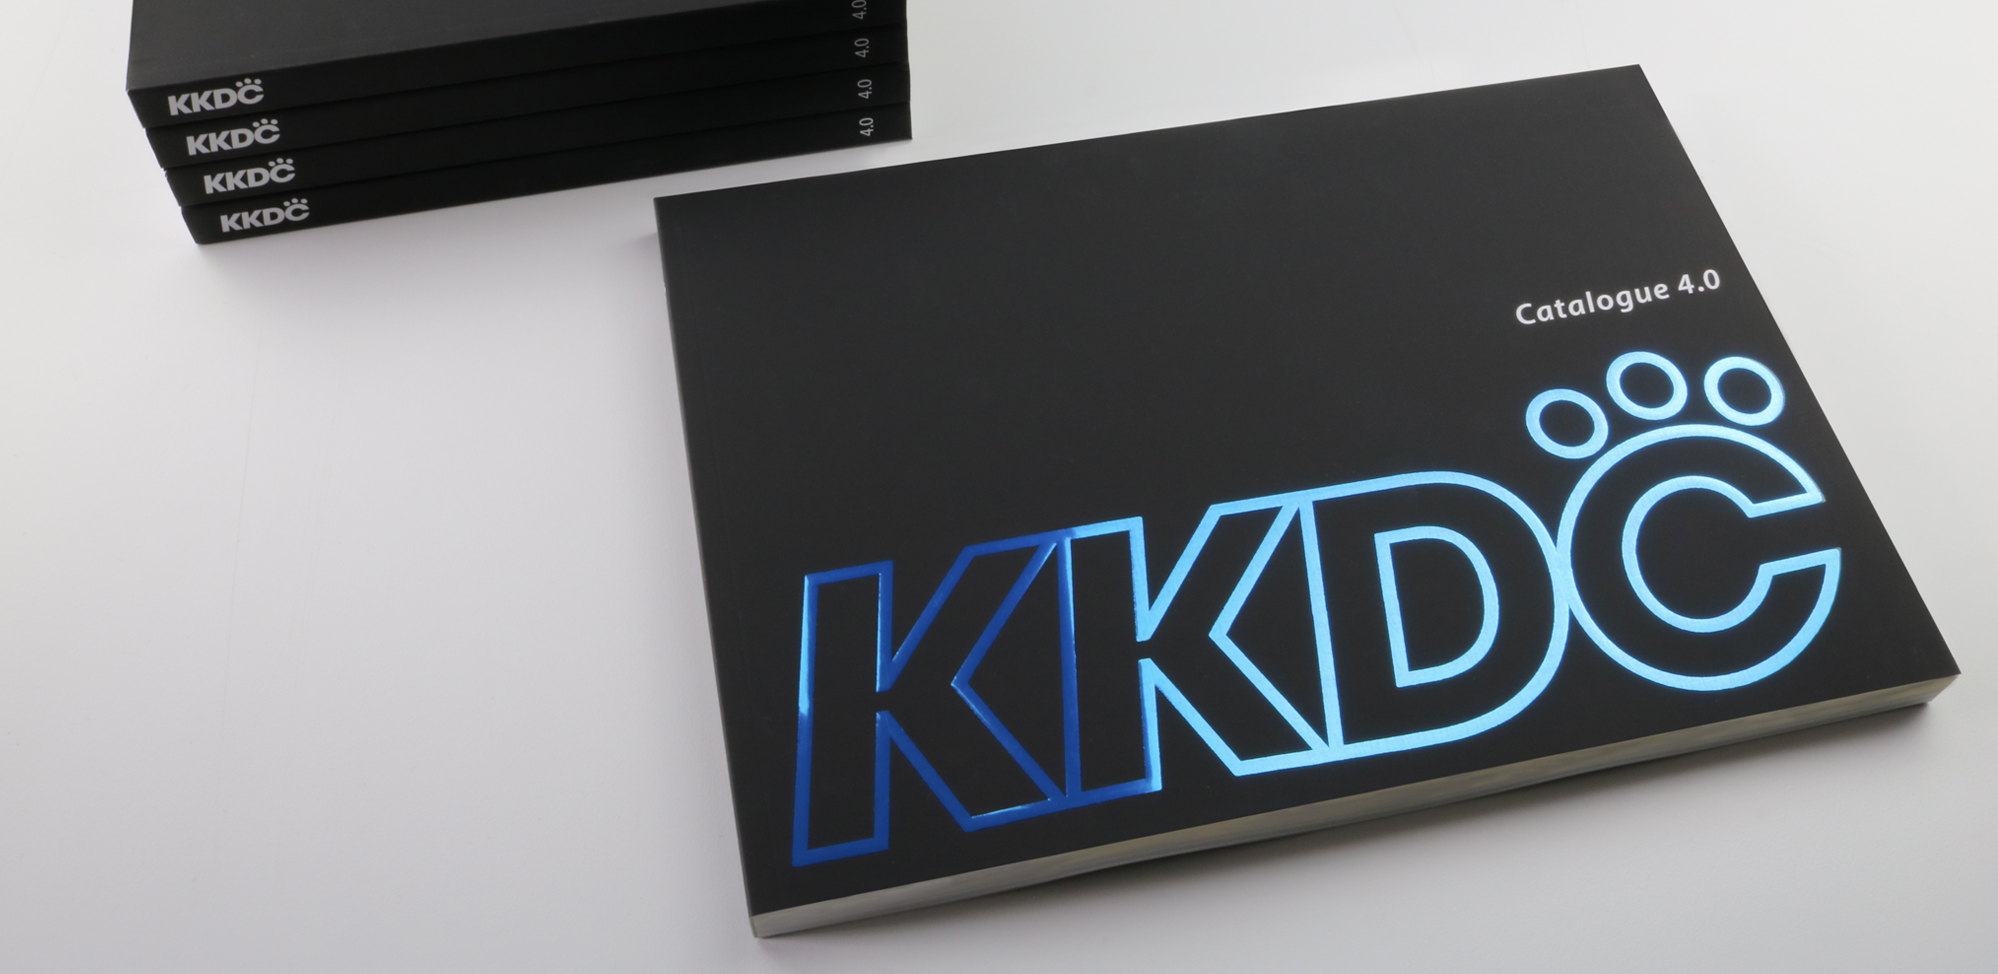 KKDC Catalogue 4.0